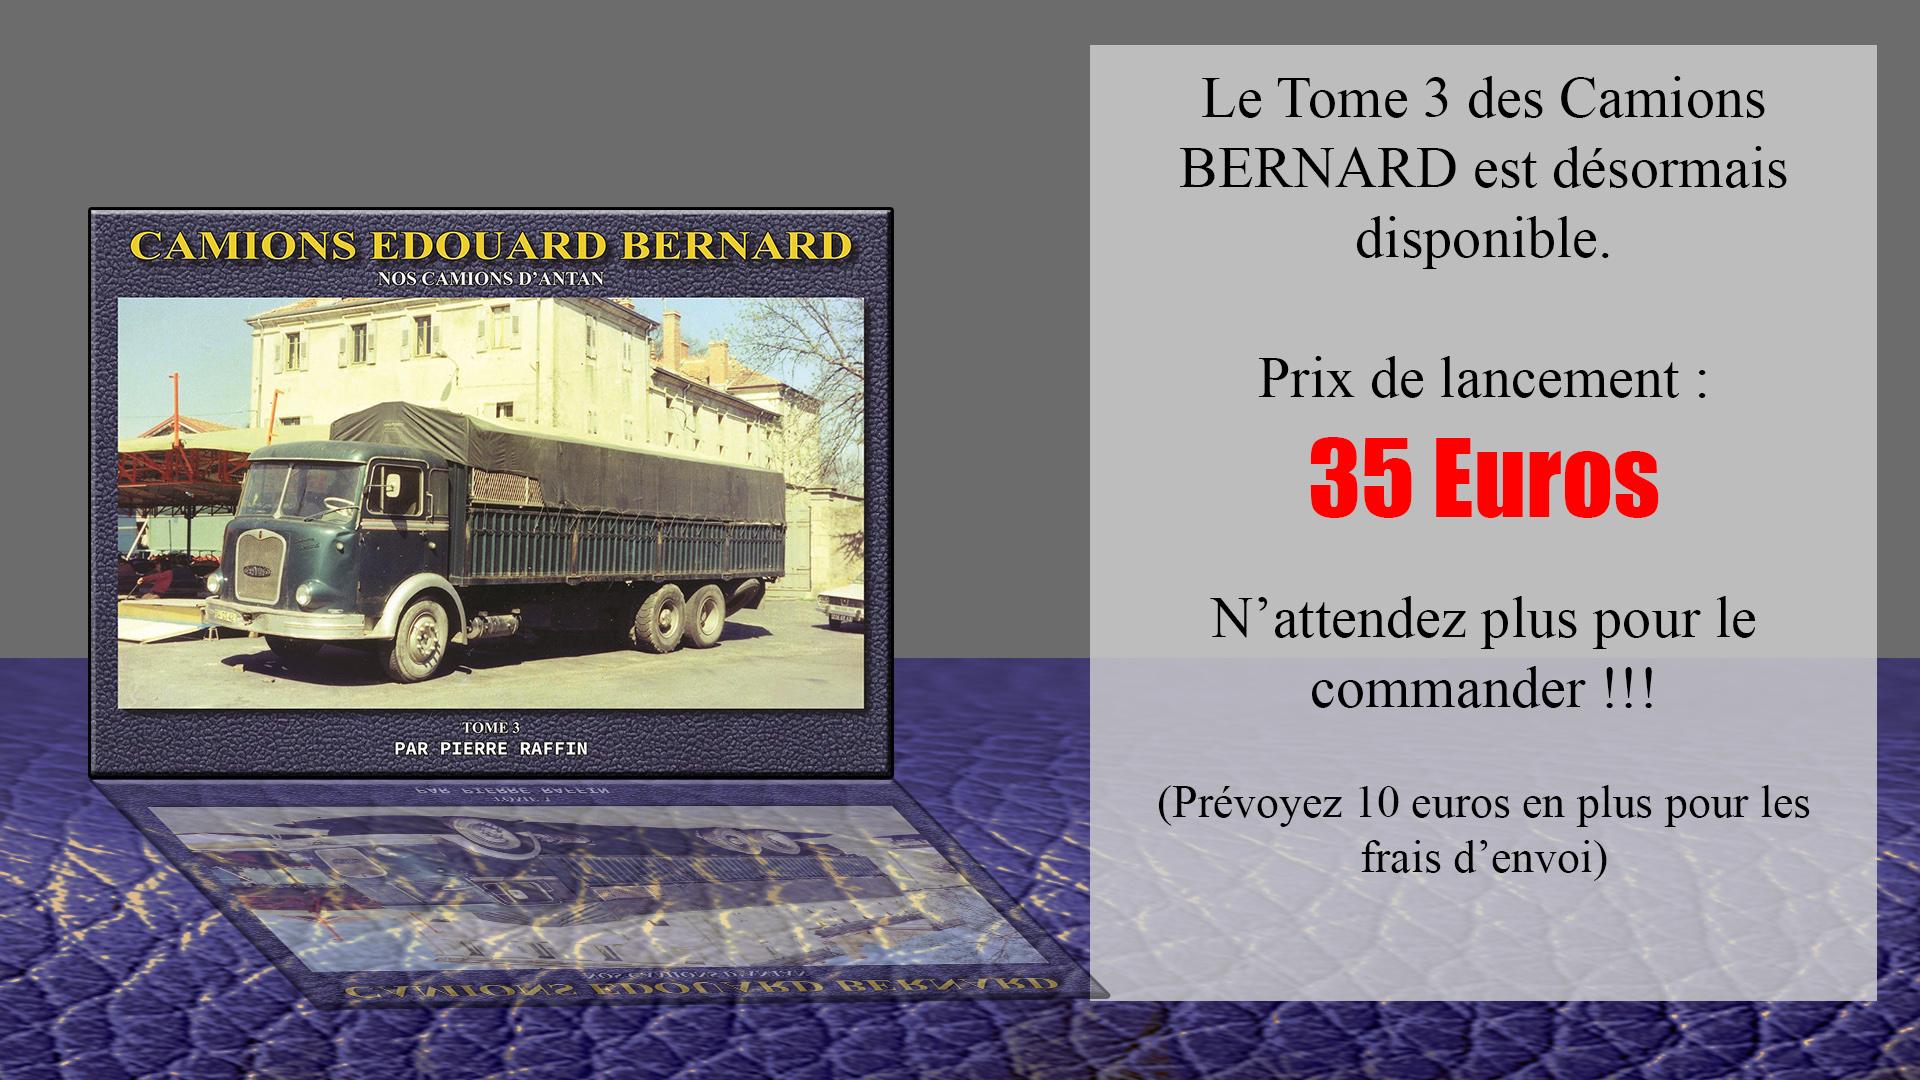 Offre de Lancement - Bernard Tome 3